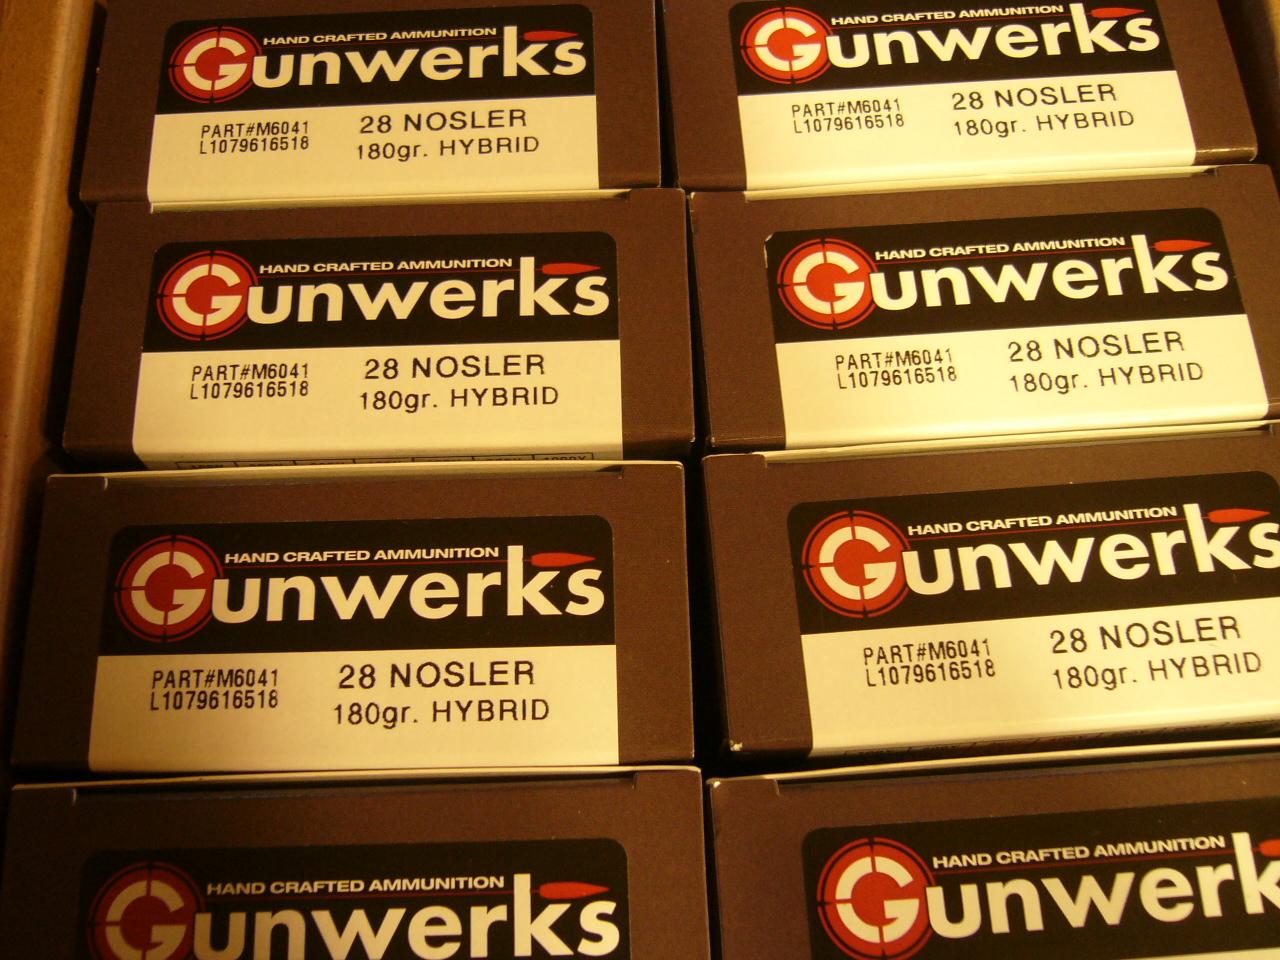 2019 GUNWERKS CLYMR 28 NOSLER SWAROVSKI ALL OPTIONS W/ AMMO+BIPOD